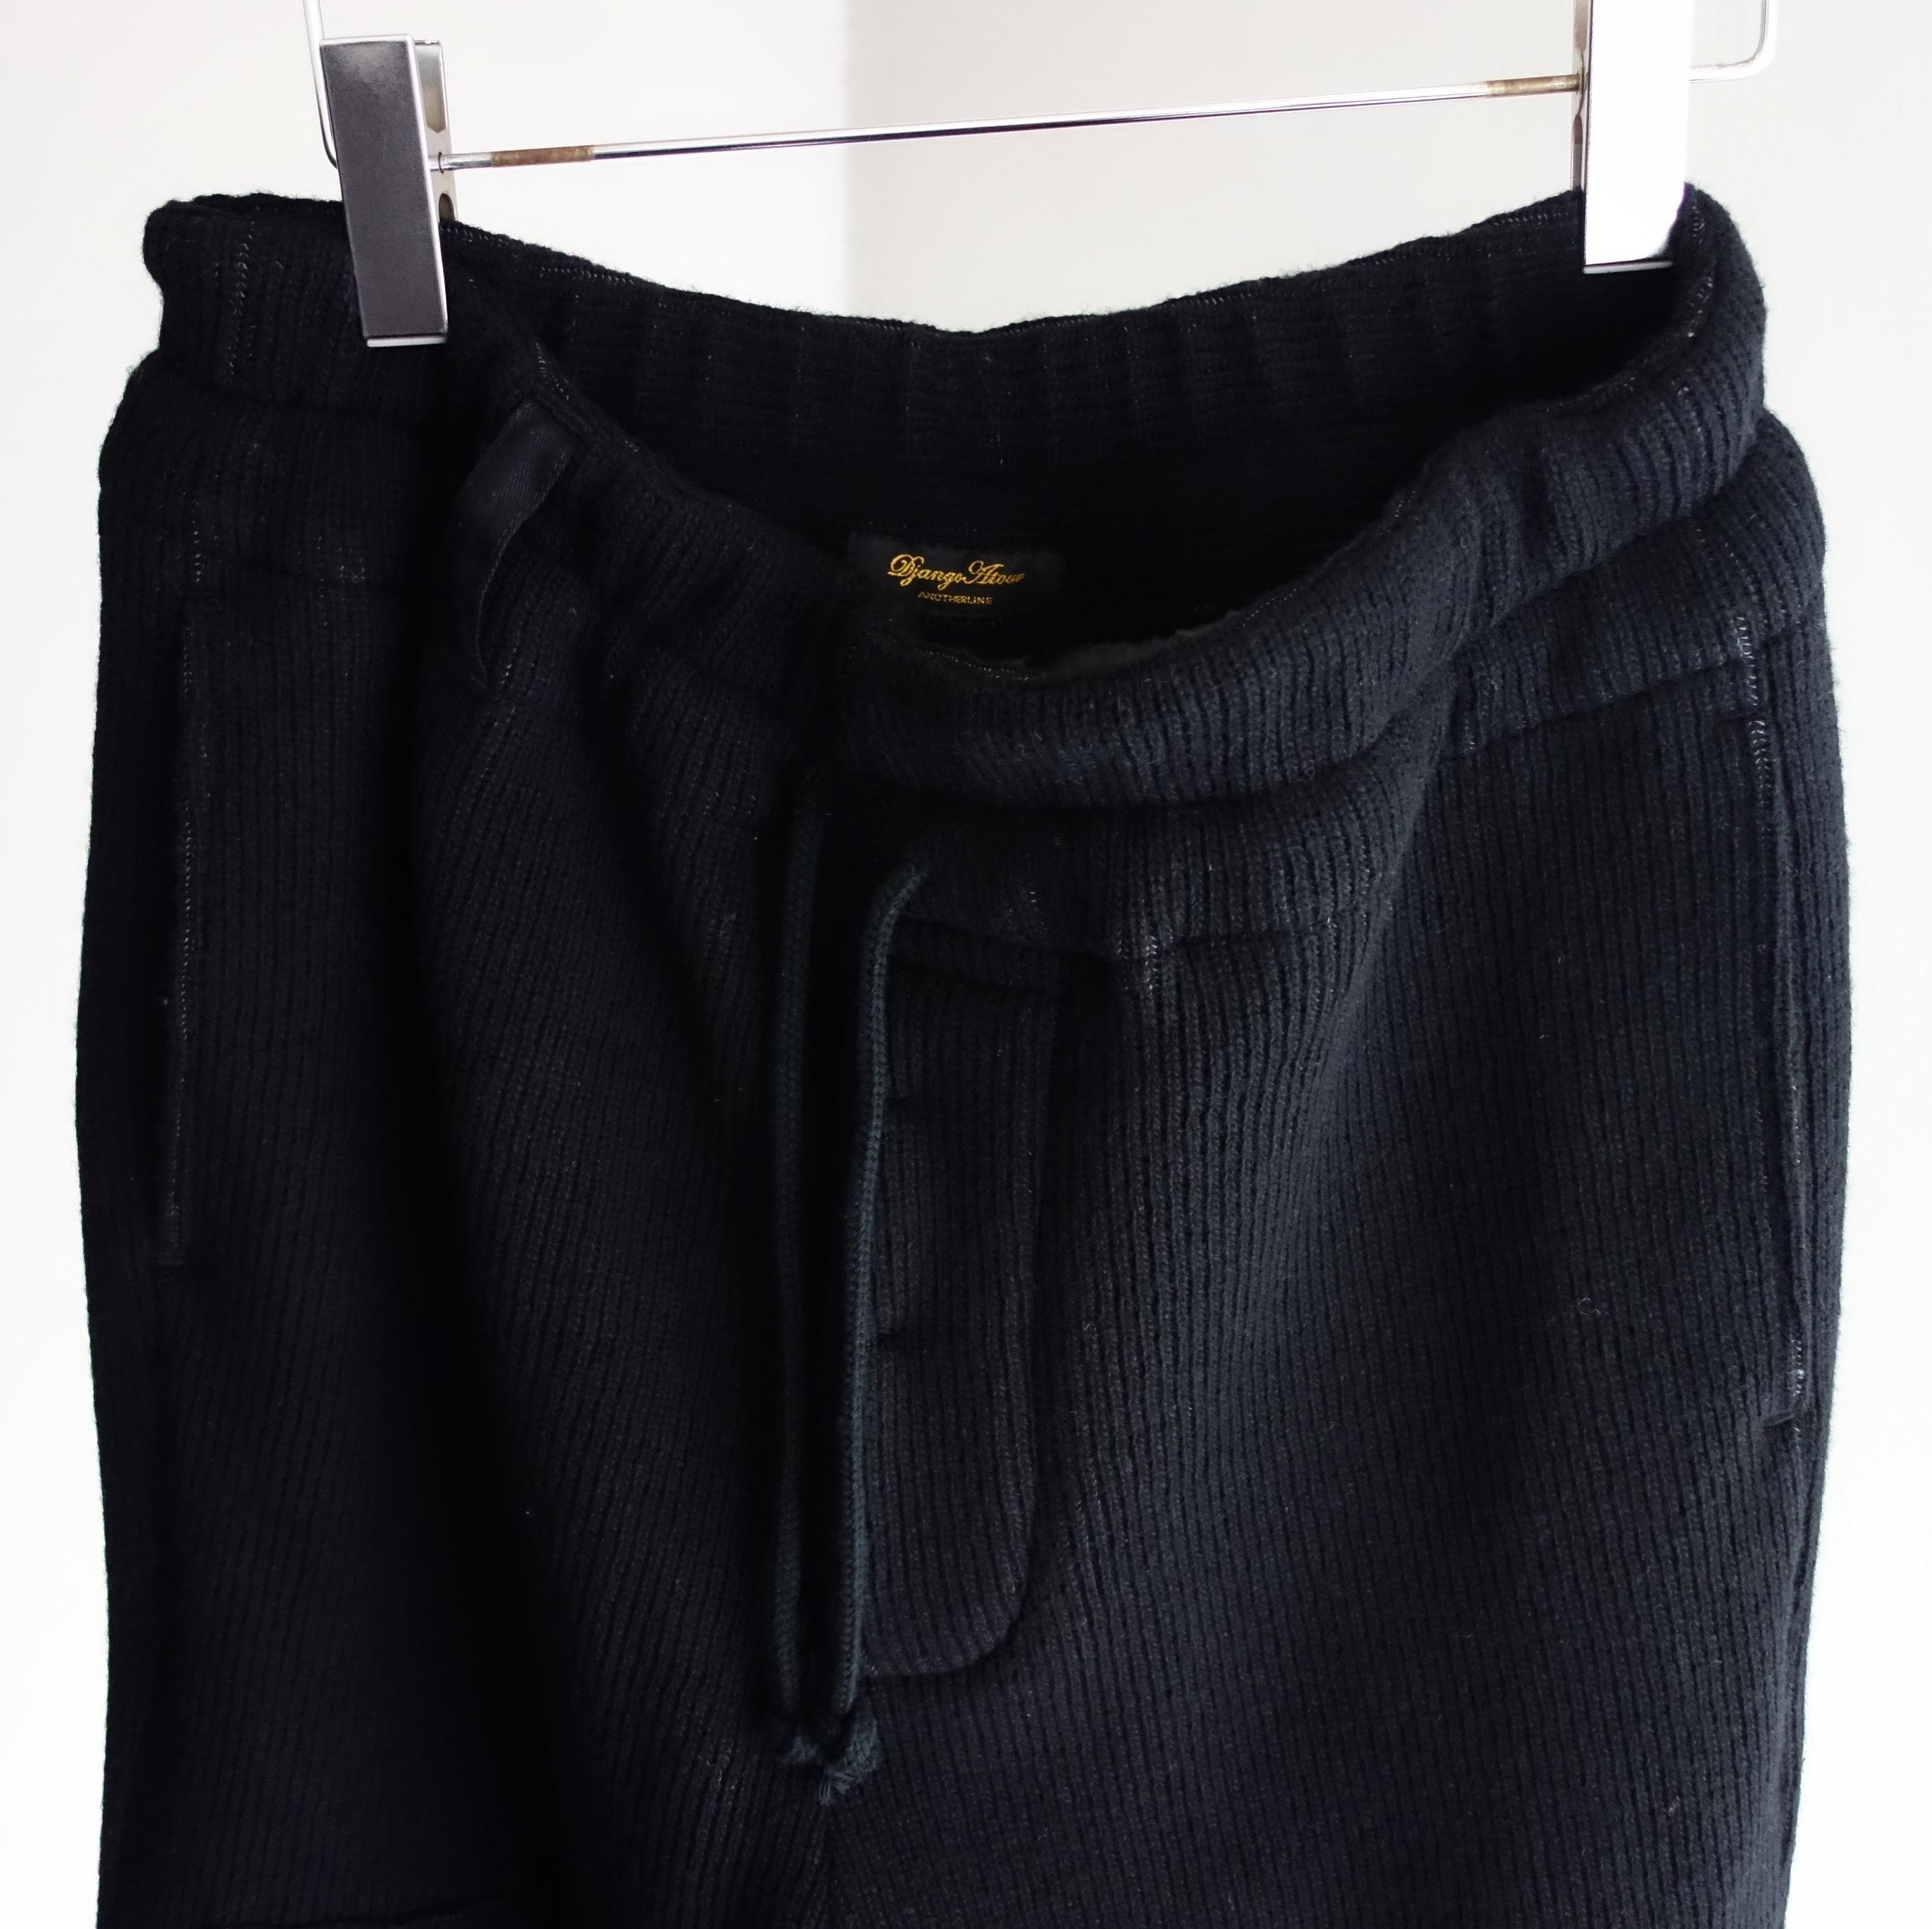 fishermanswork quarterknit knickers / black